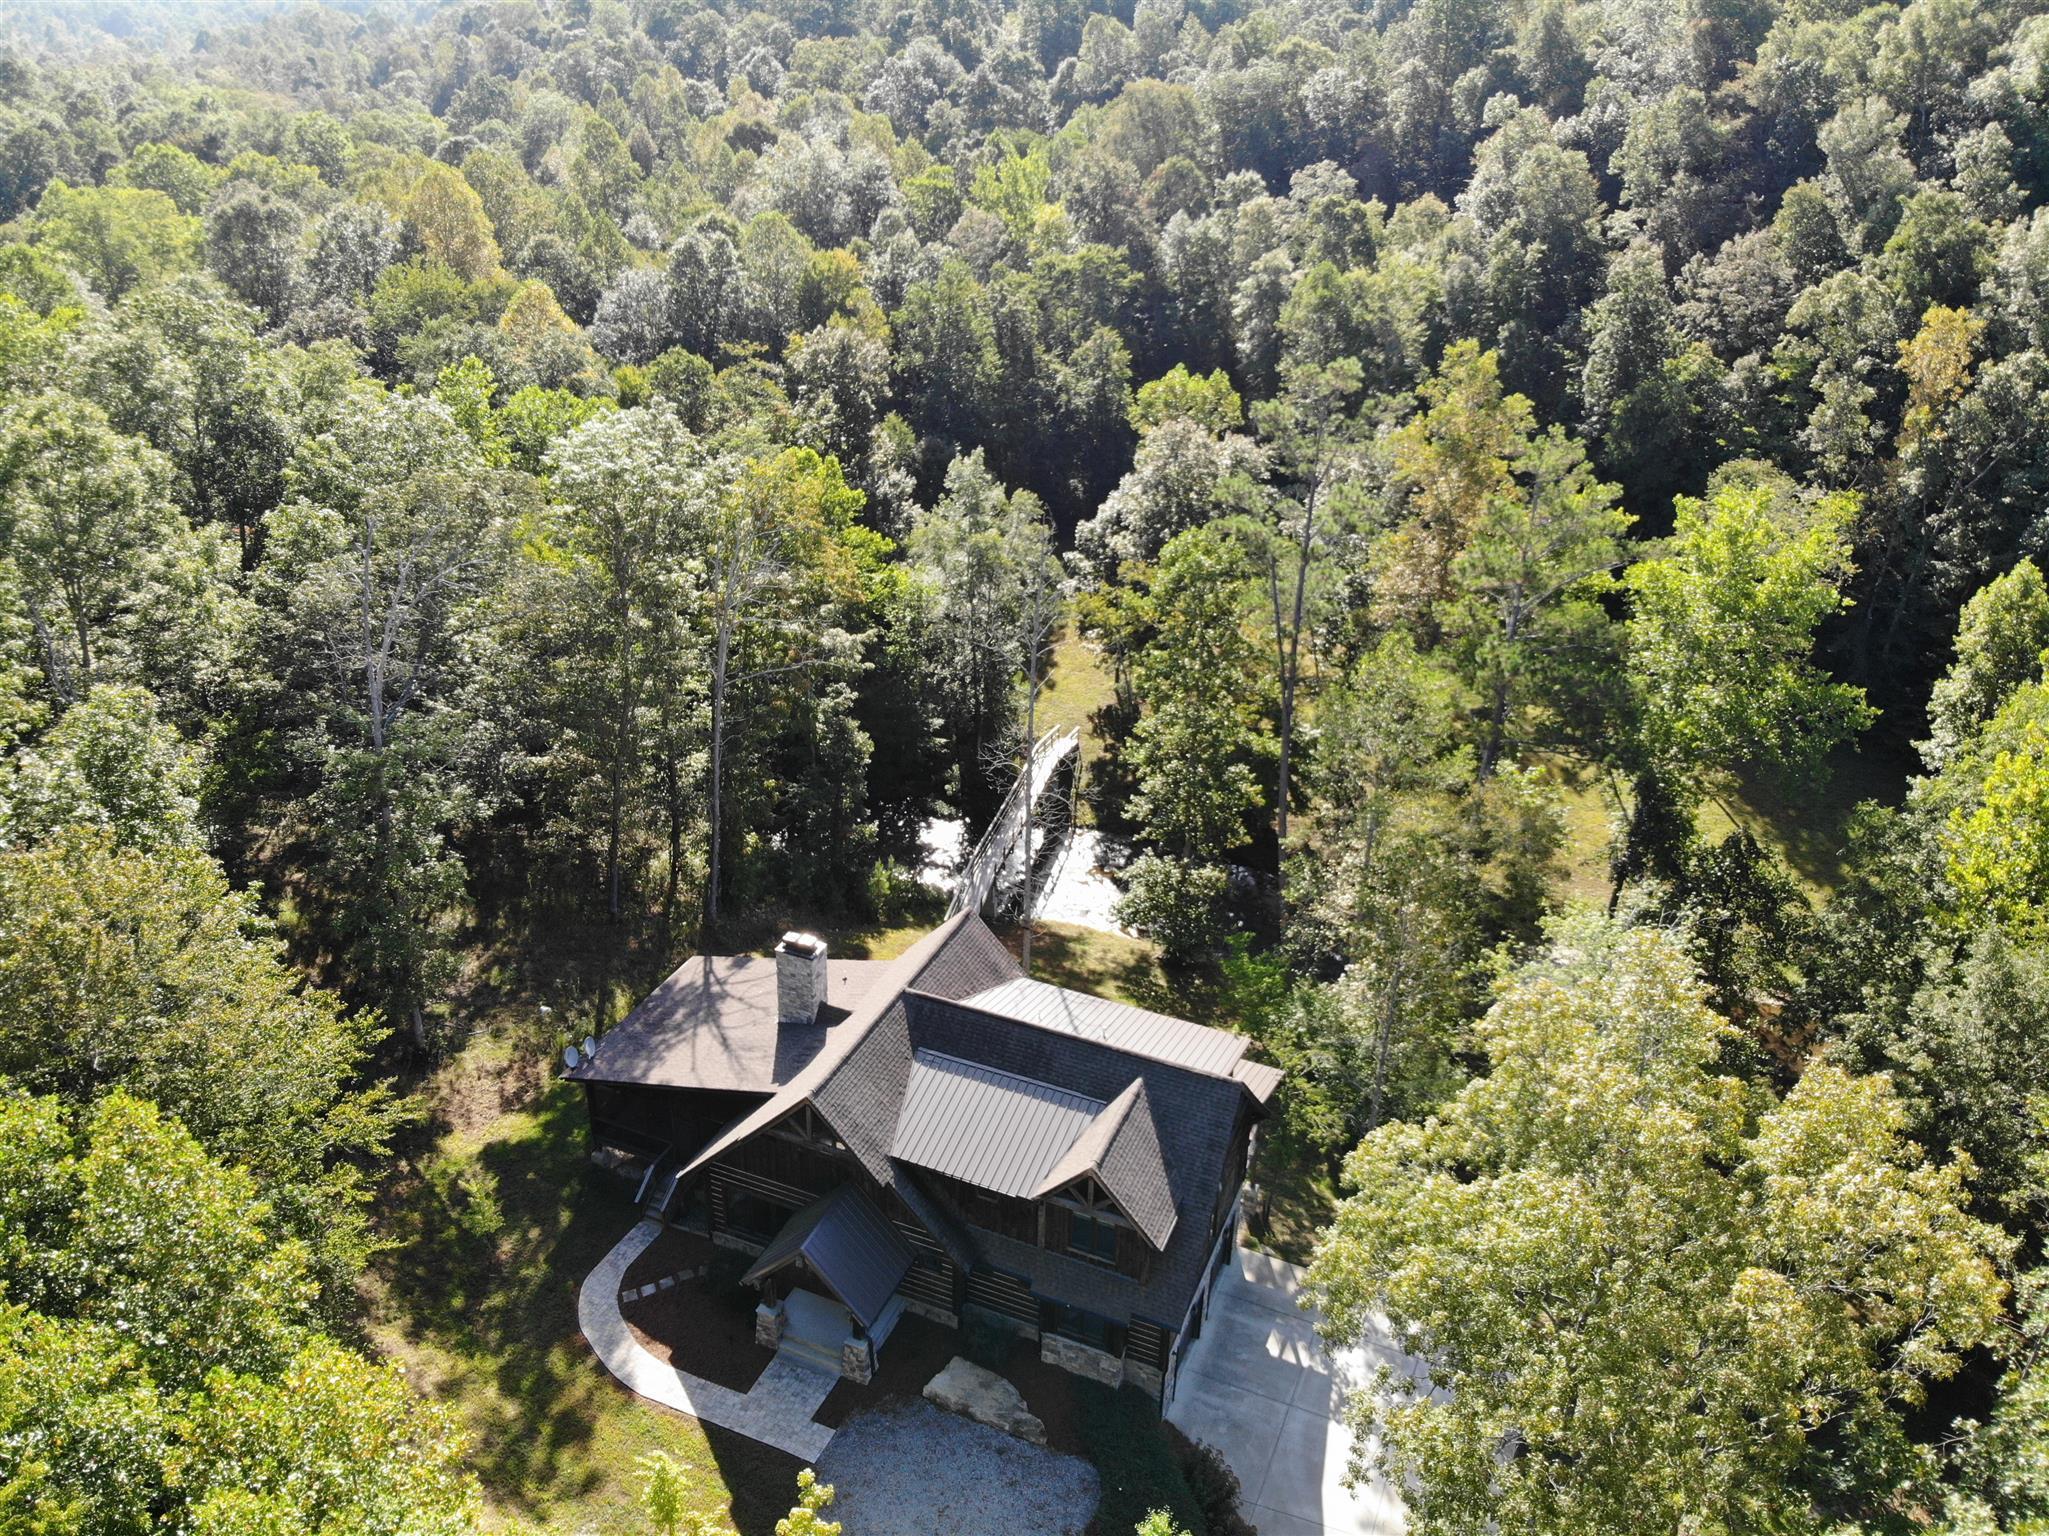 7833 Barnhill Rd, Primm Springs, TN 38476 - Primm Springs, TN real estate listing